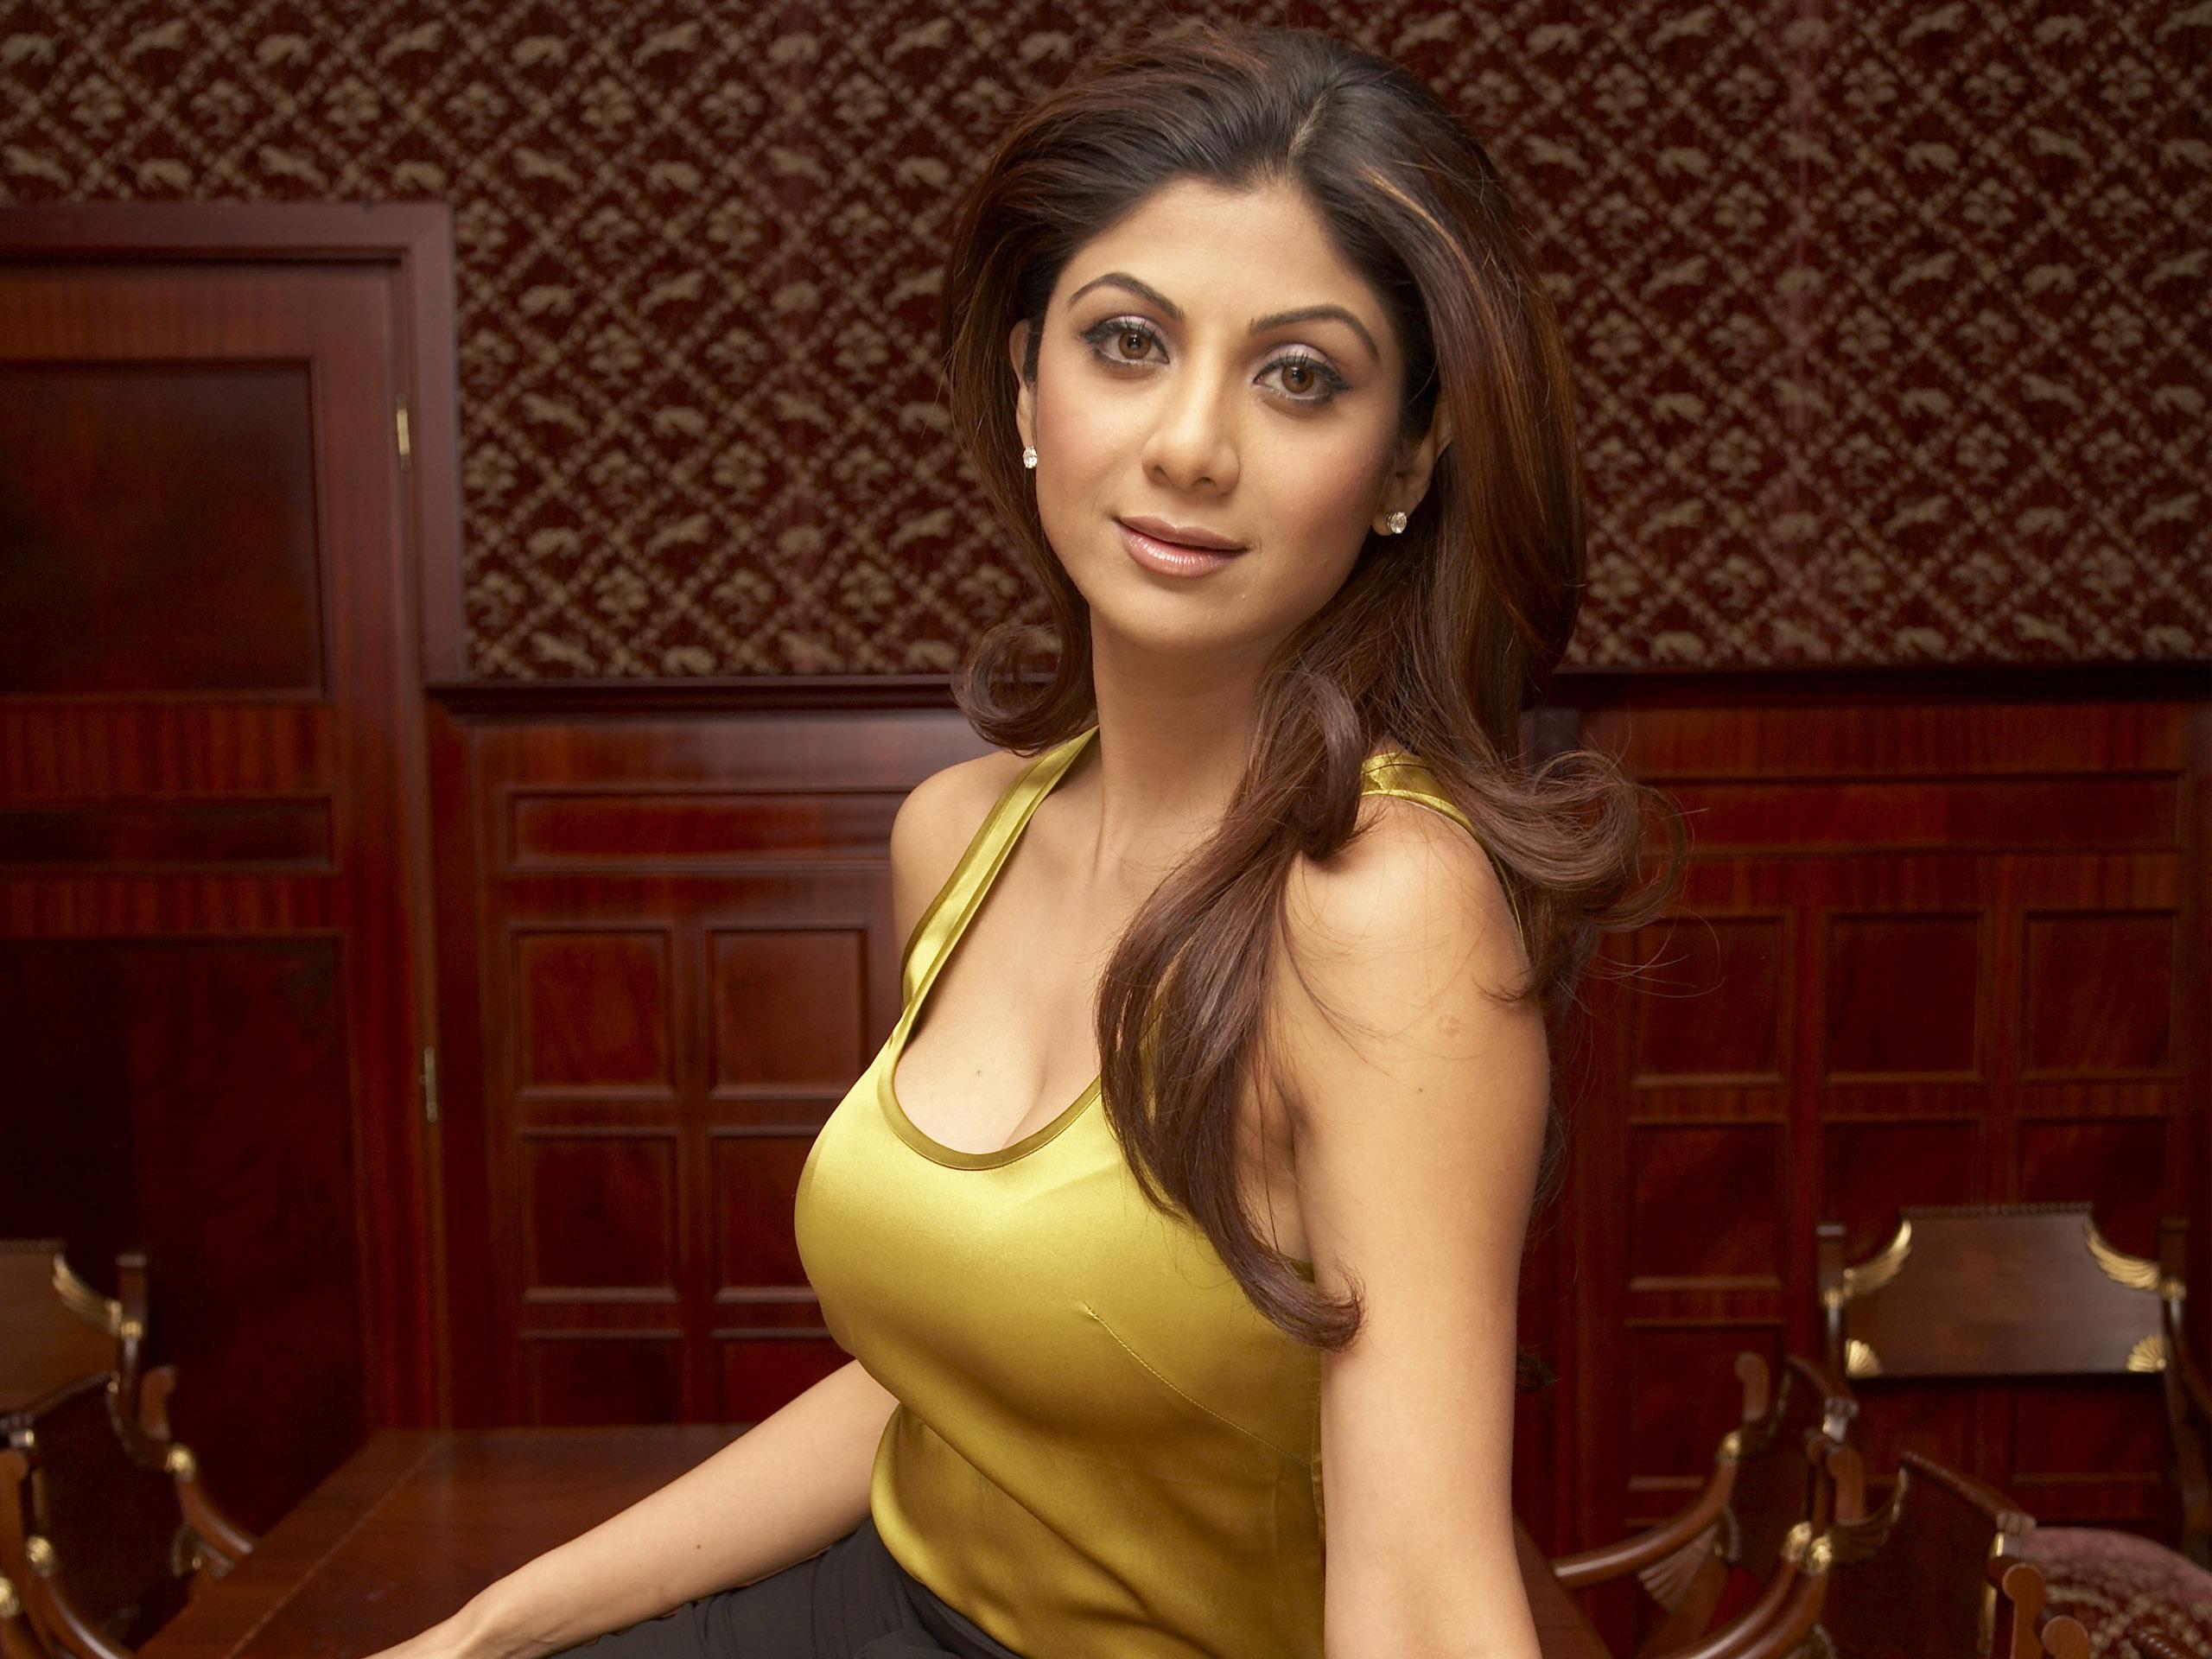 Free Karishma Kapur And Kareena Kapoor Xxx Hd Wallpapers